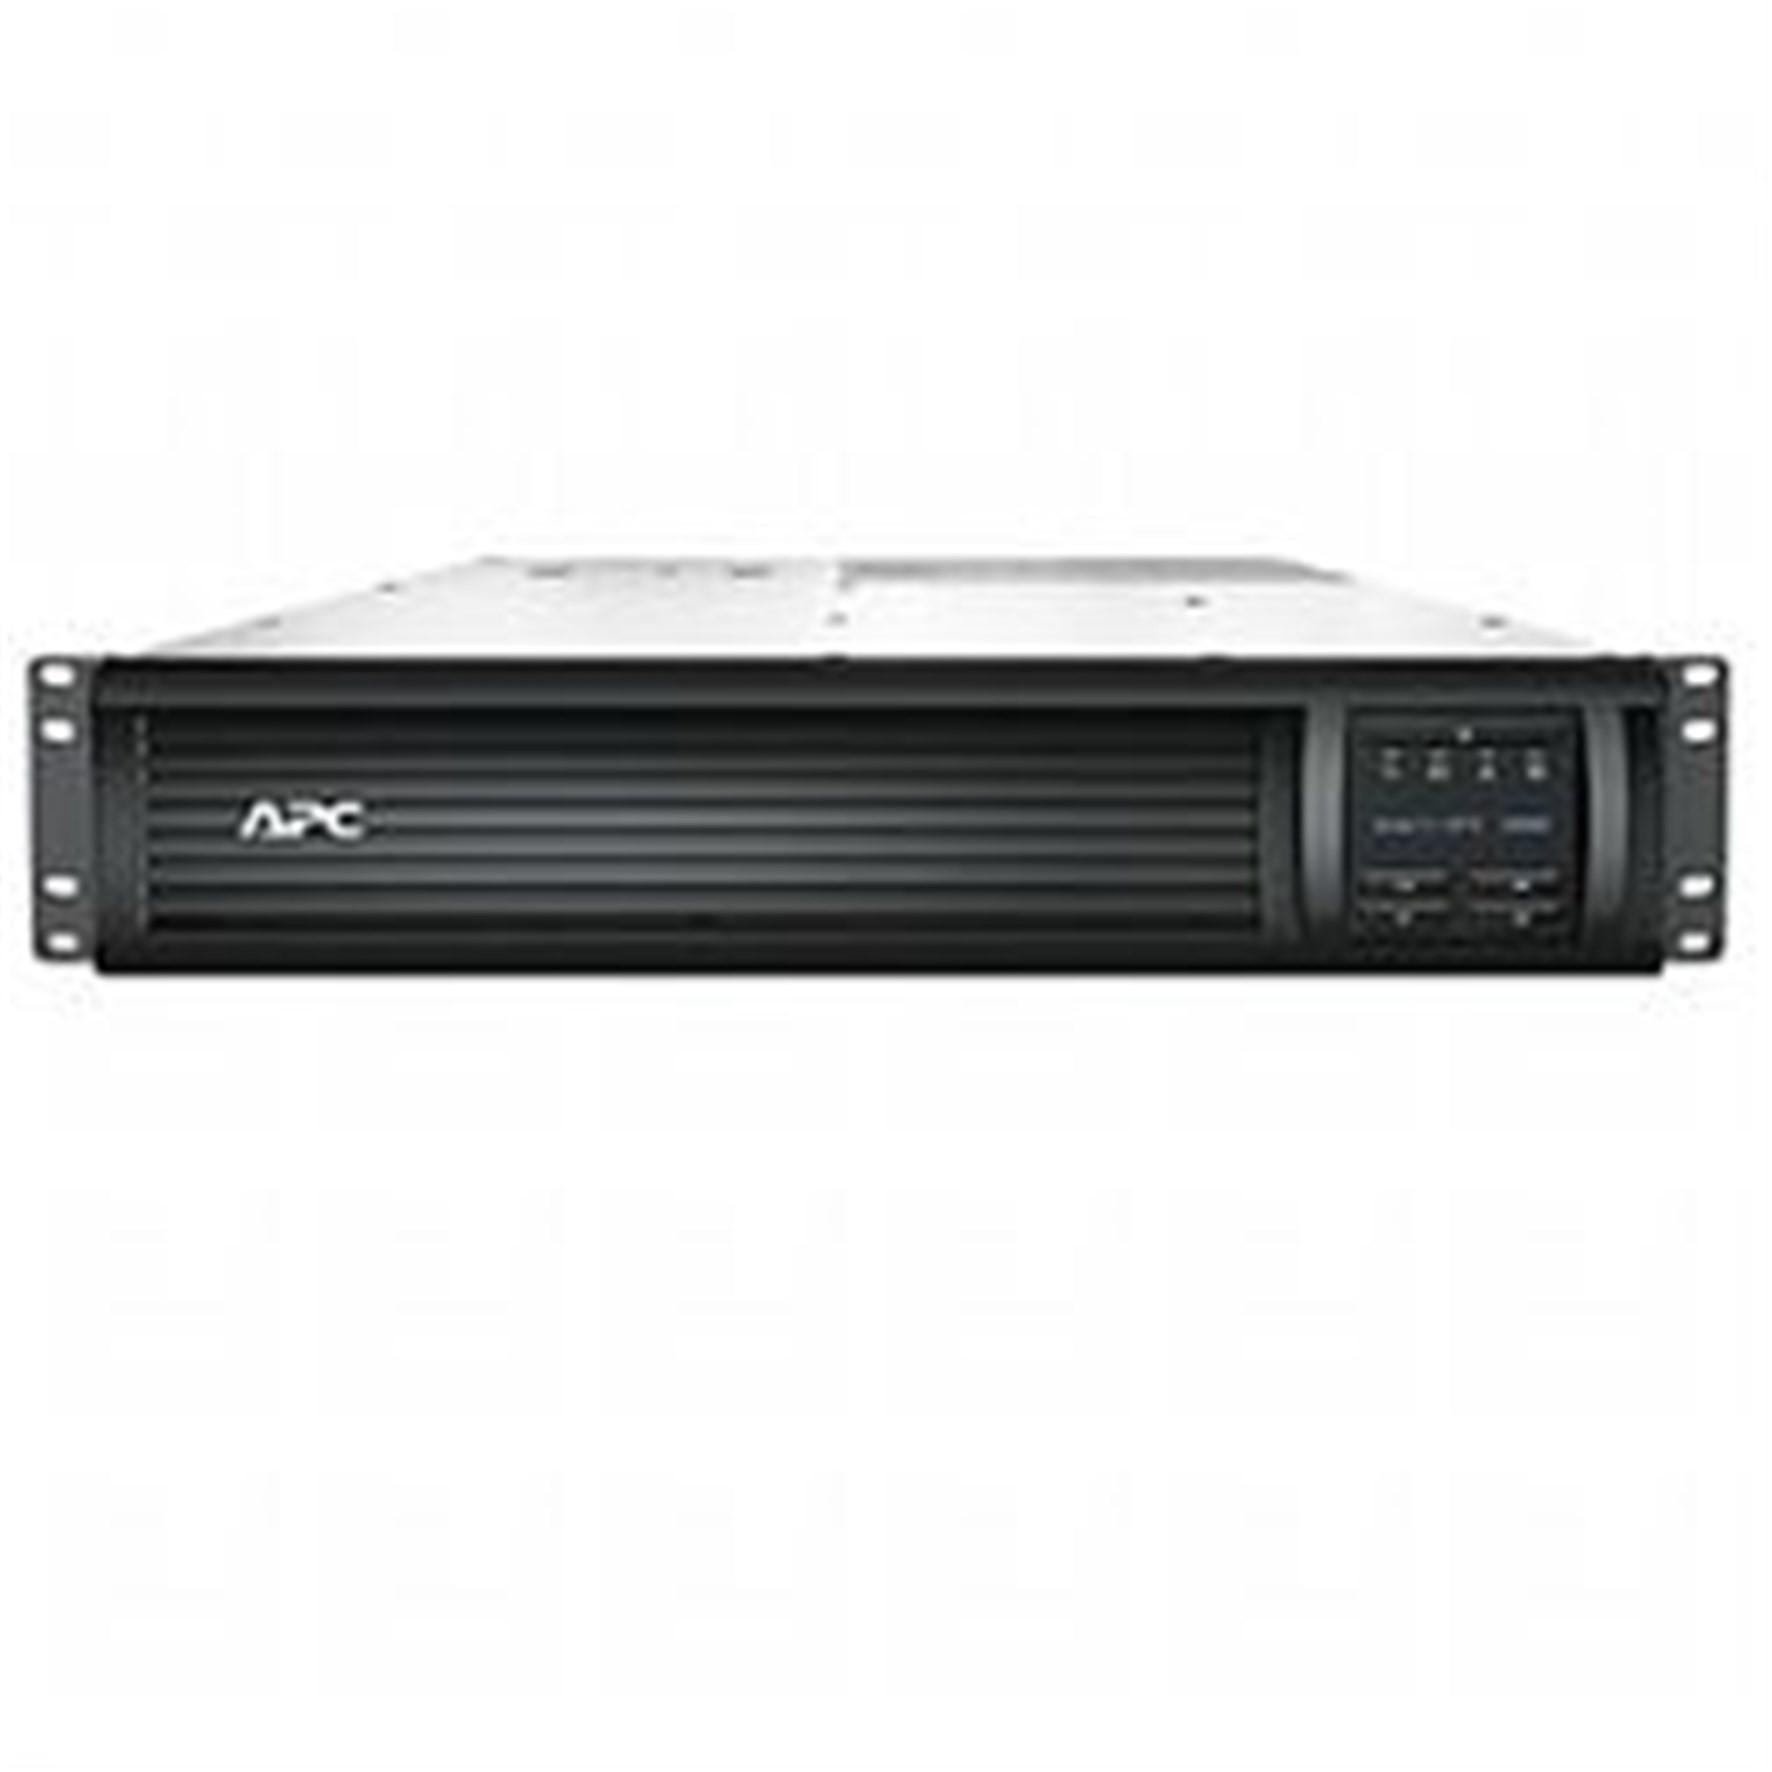 APC Nobreak SMART-UPS T 3000VA/2700W Entrada 115V / Saida 115V Mono - Padrao RACK 2U (acompanha KIT Trilho) / Line Interactive / Senoidal